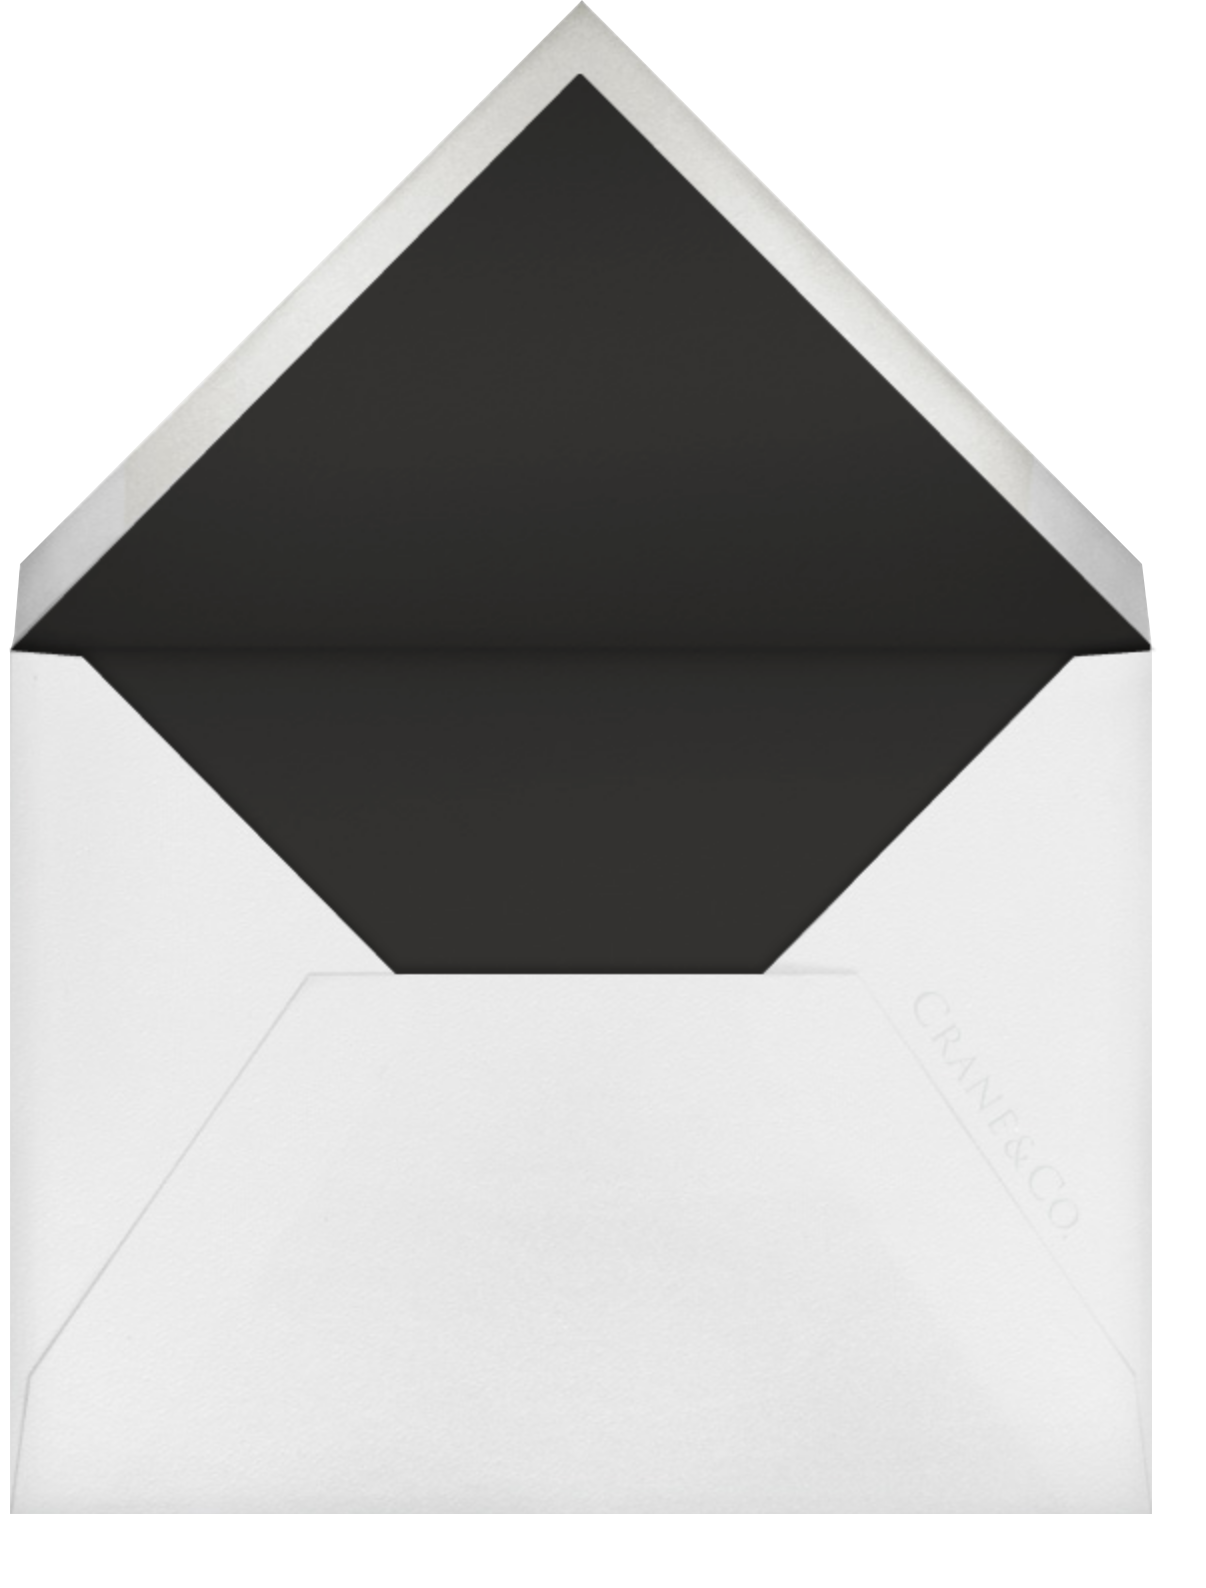 Octavo - Regent Blue - Paperless Post - Engagement party - envelope back